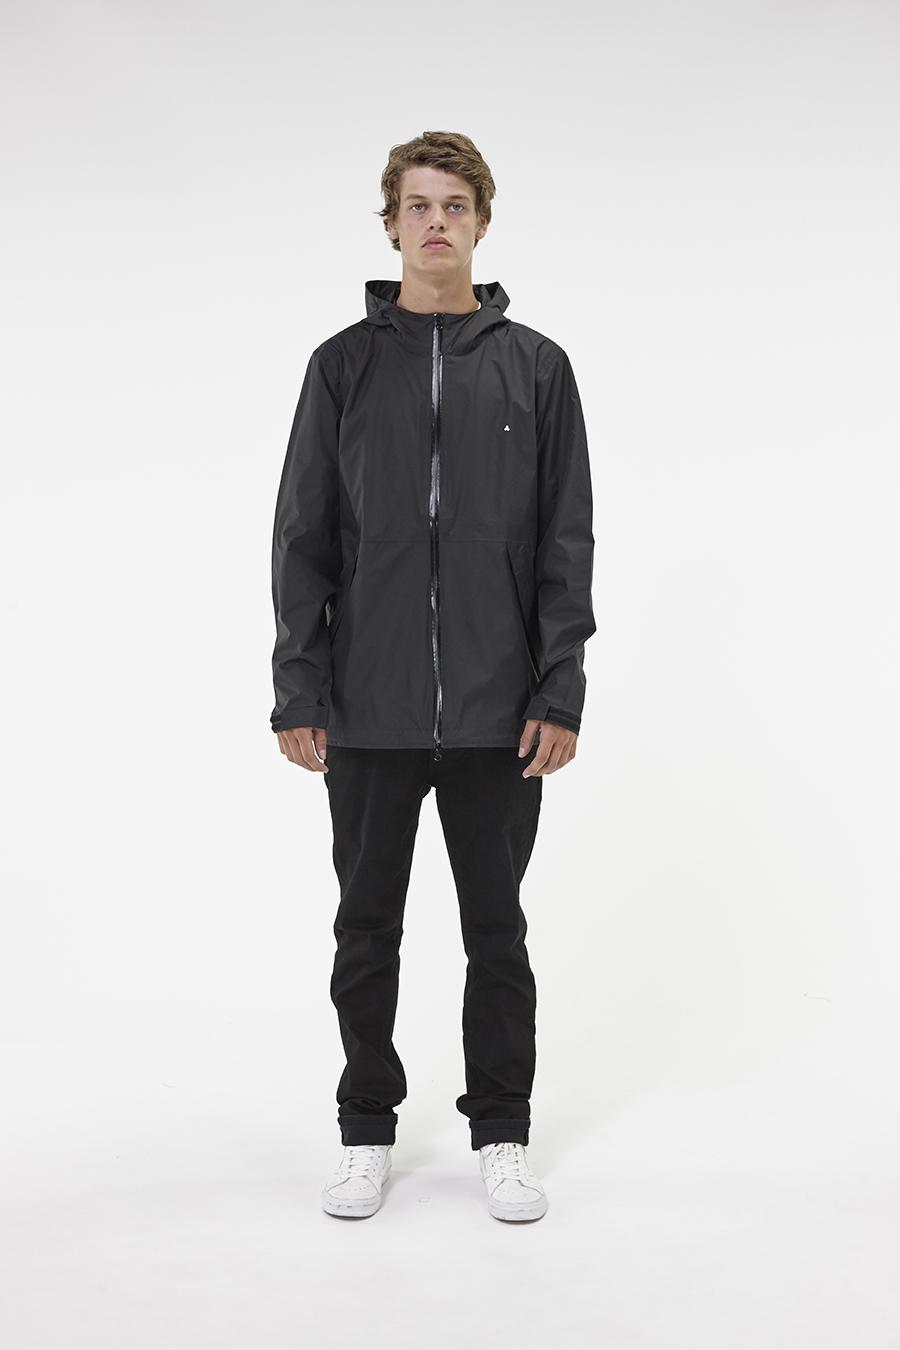 Huffer_Q3-16_M-Alpine-Jacket_Black-01